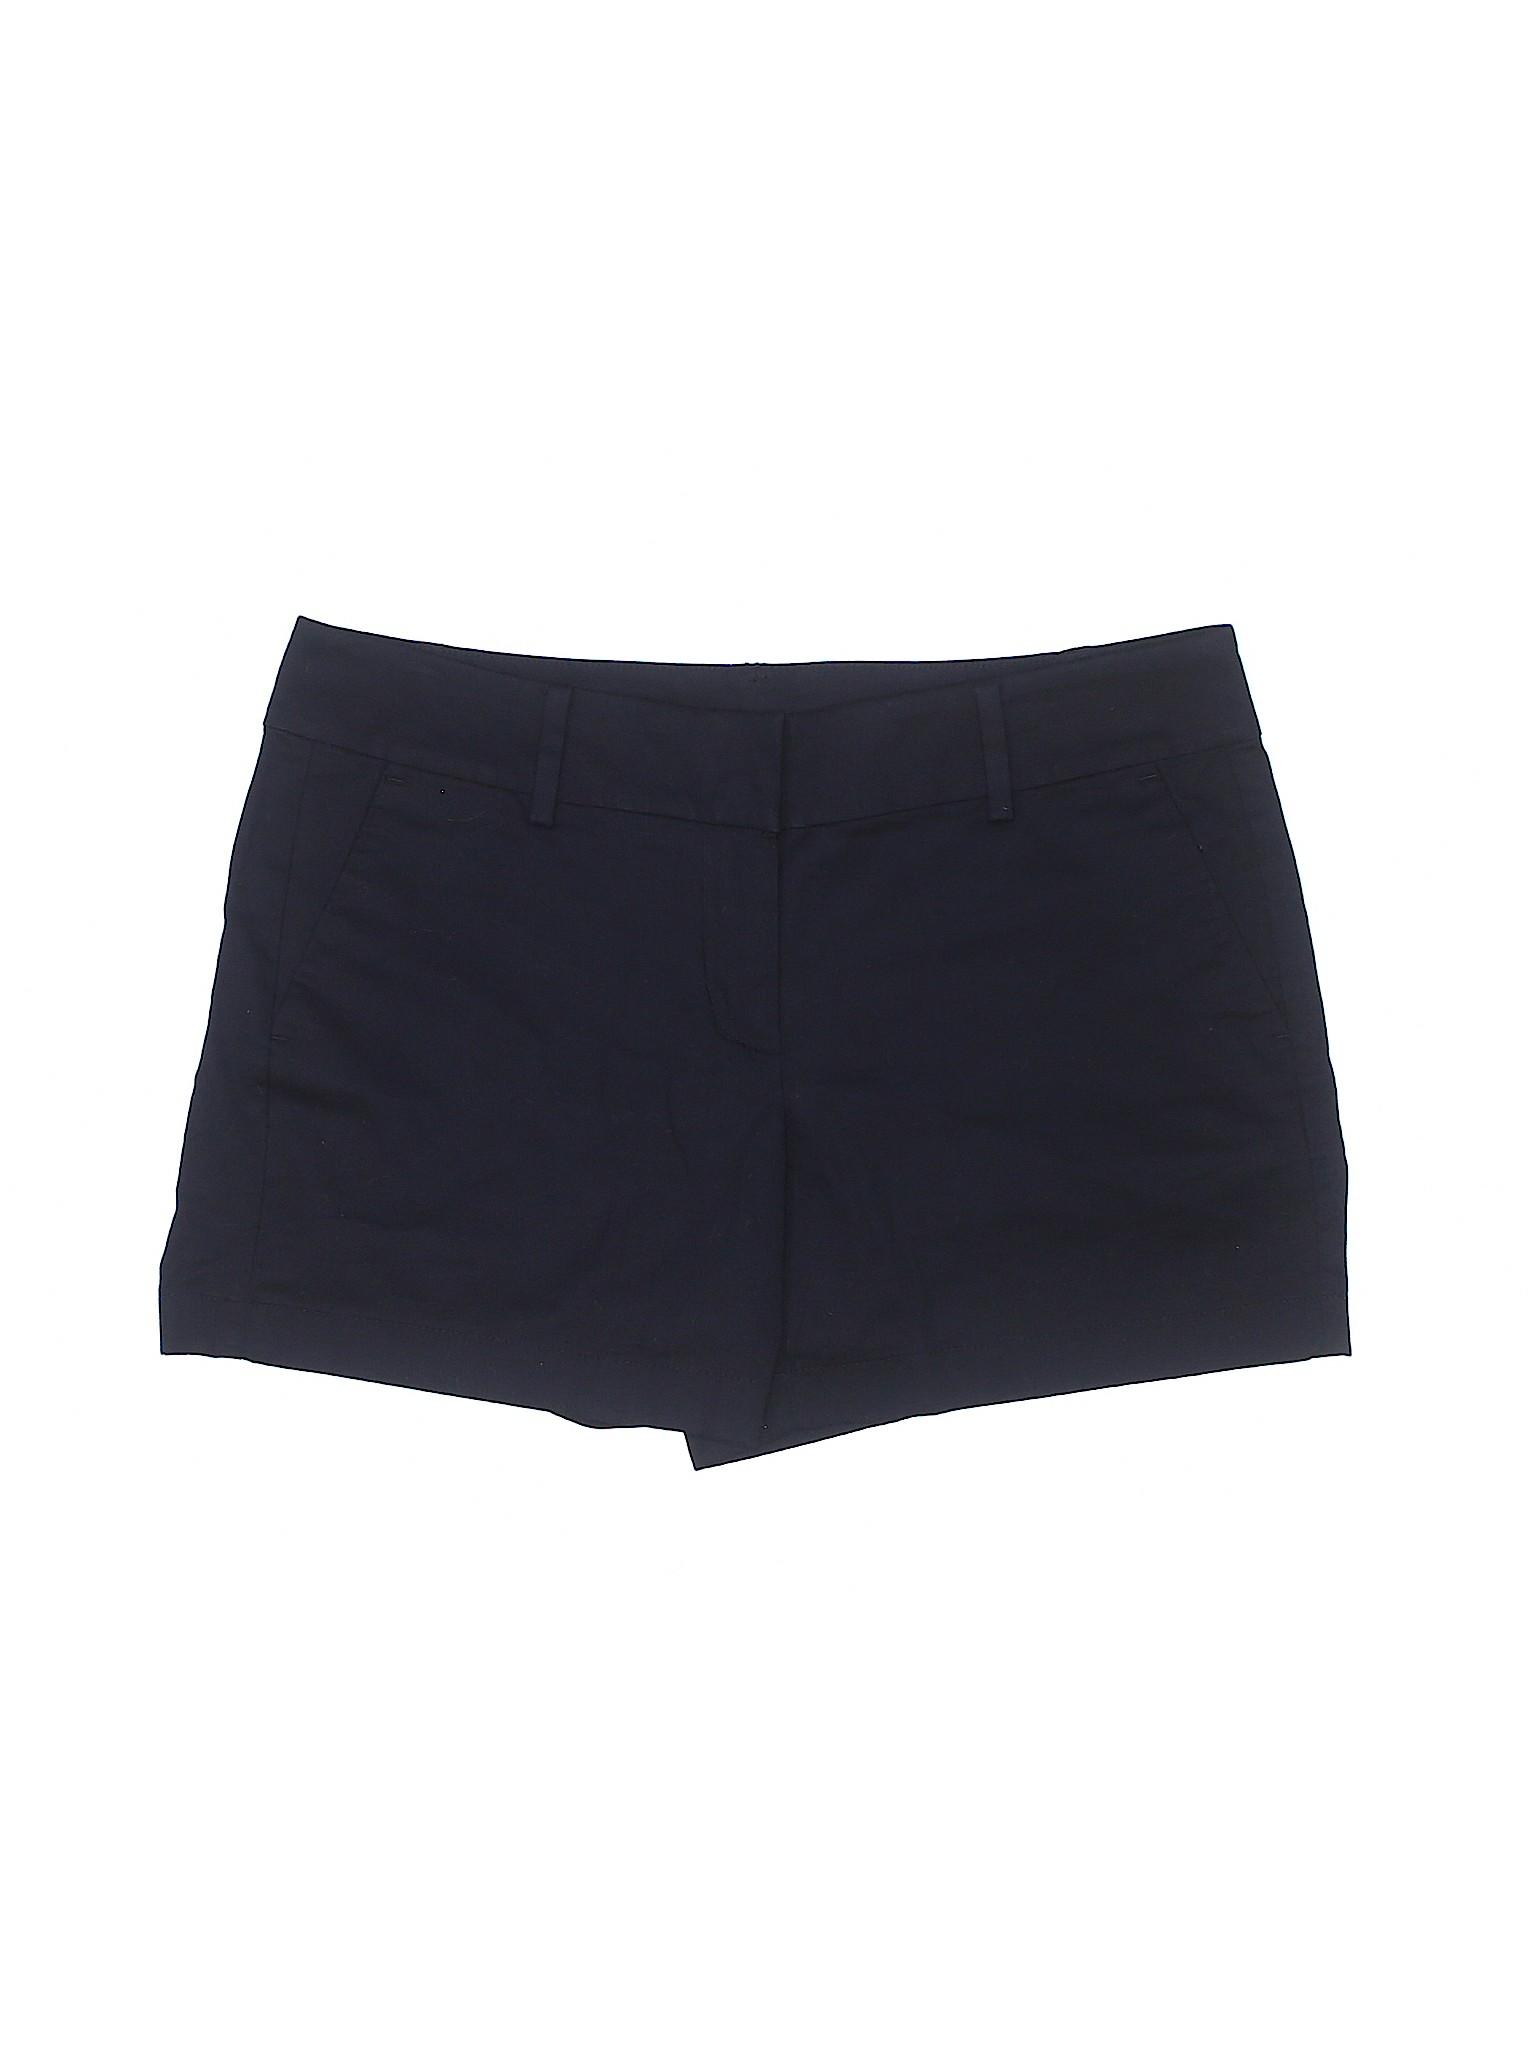 Ann Ann Khaki Khaki Taylor Taylor Boutique Shorts Boutique wIna4Fq